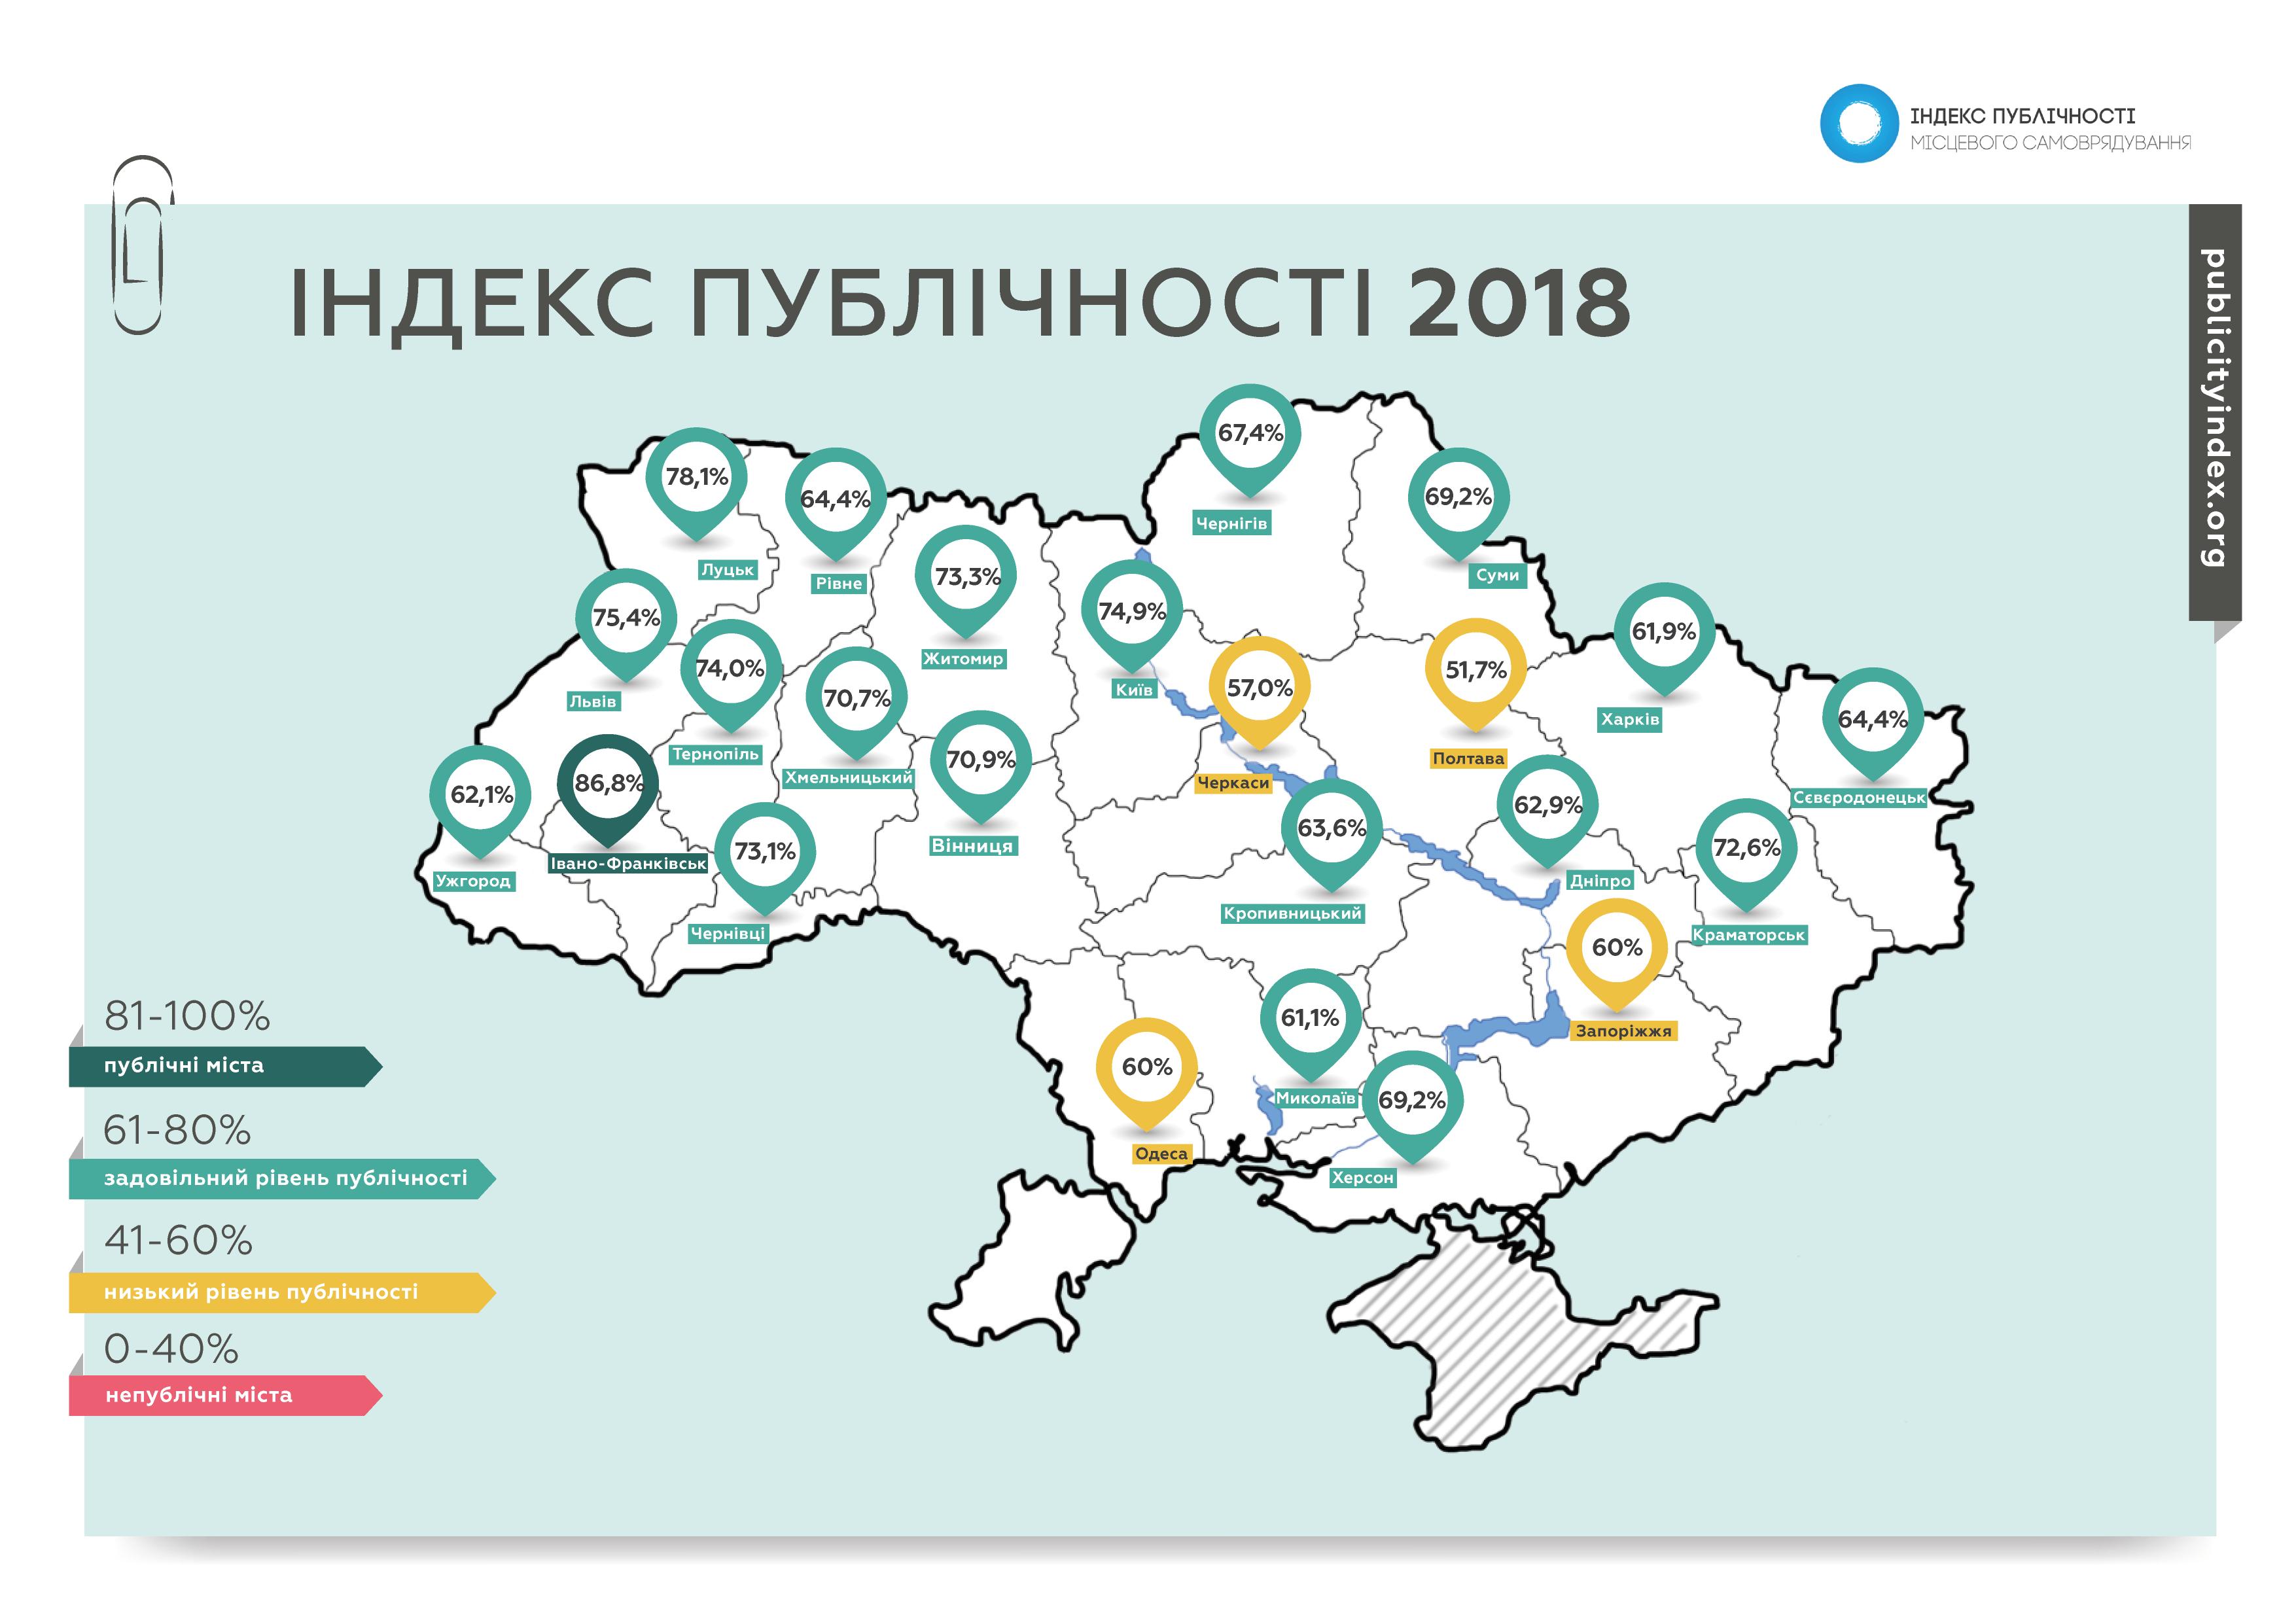 https://galka.if.ua/app/uploads/2019/10/Opora_Indeks_publichnosti_-02.png